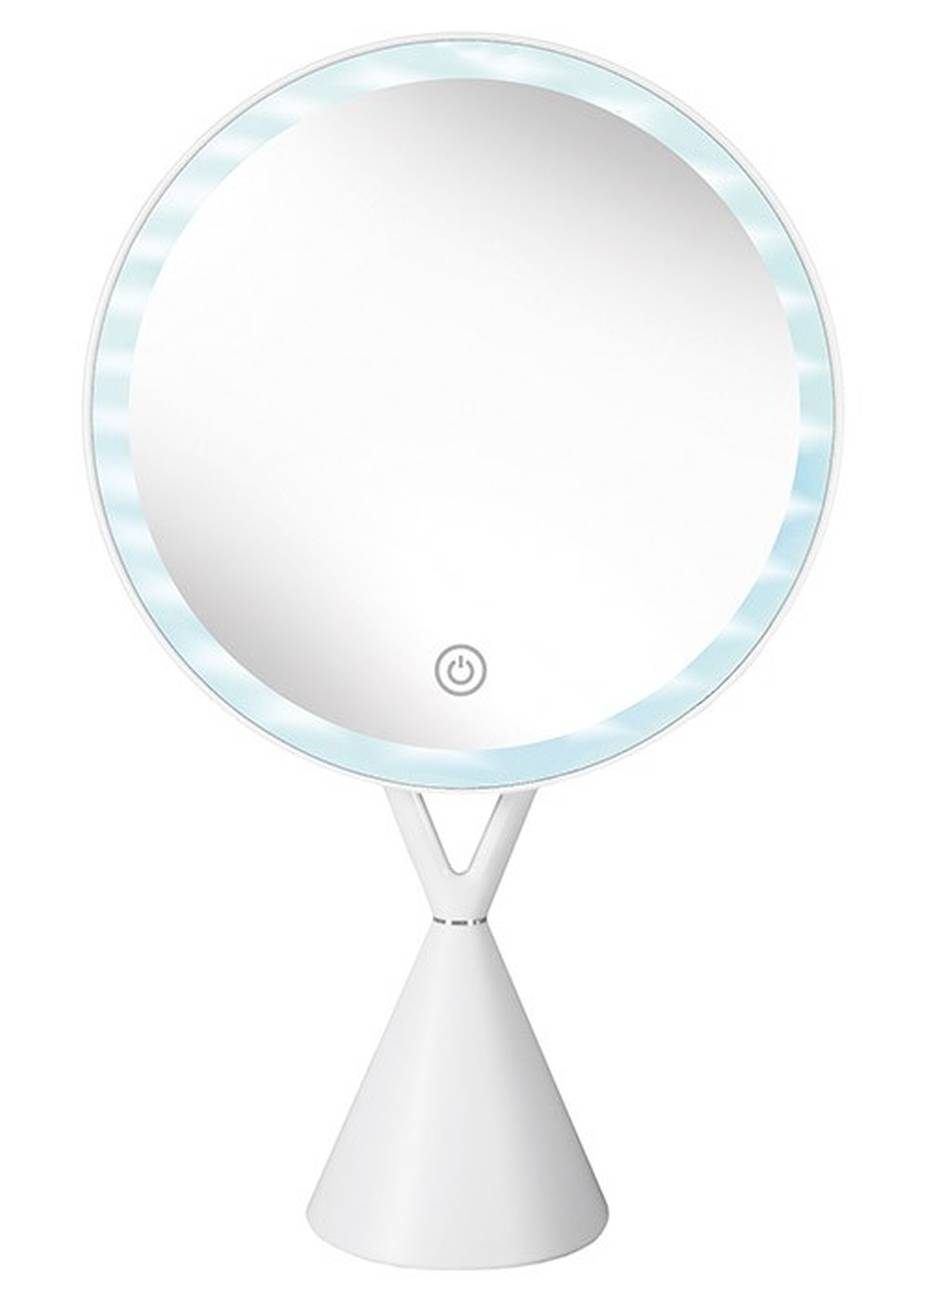 Kosmetikspiegel Lady Mirror ABS/Glas/LED Weiss Spiegel